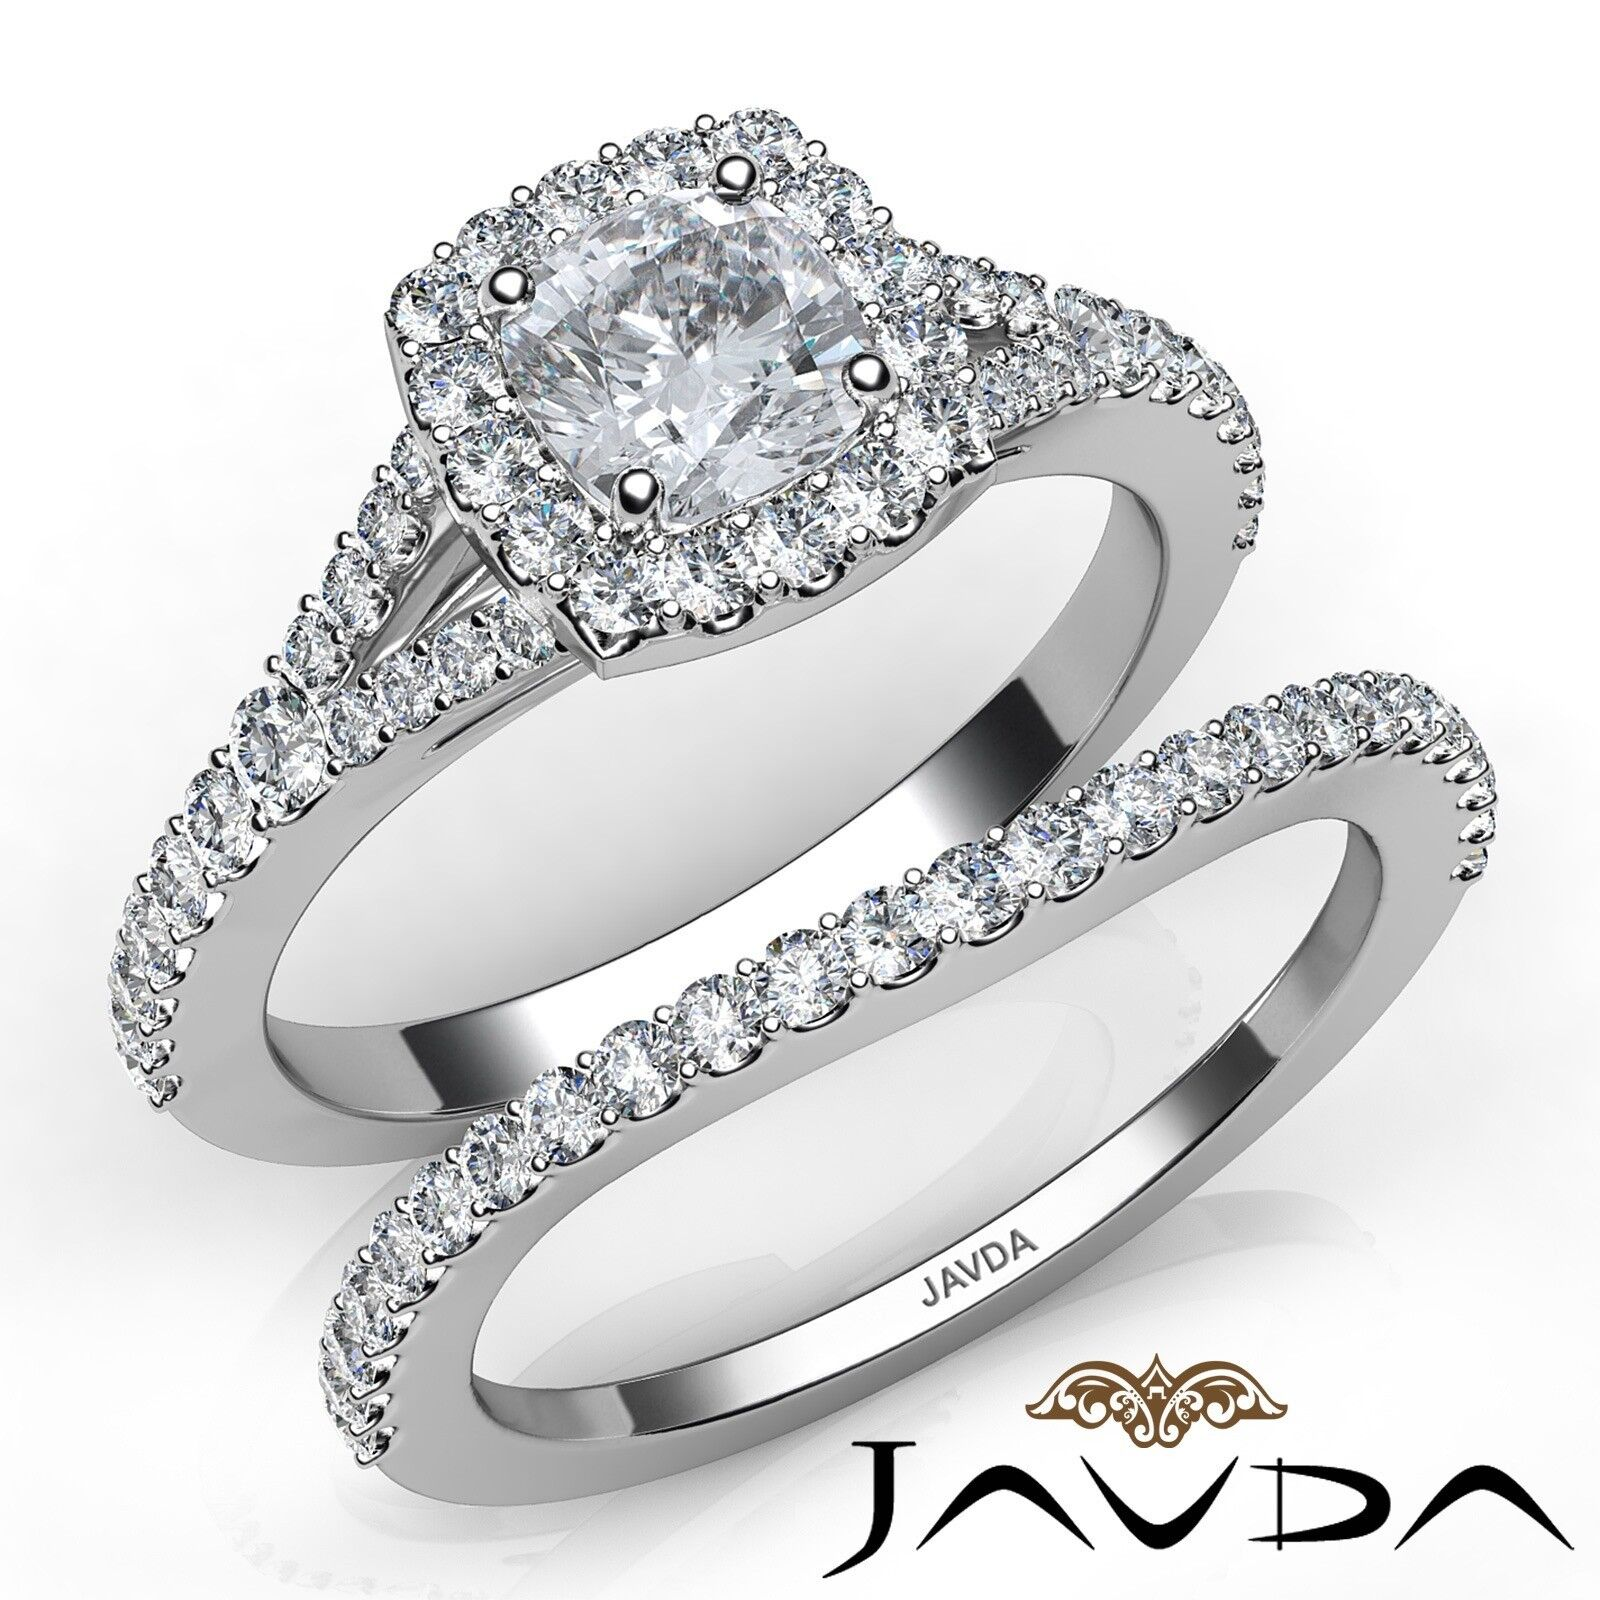 1.46ctw U Cut Pave Halo Bridal Cushion Diamond Engagement Ring GIA E-VS1 W Gold